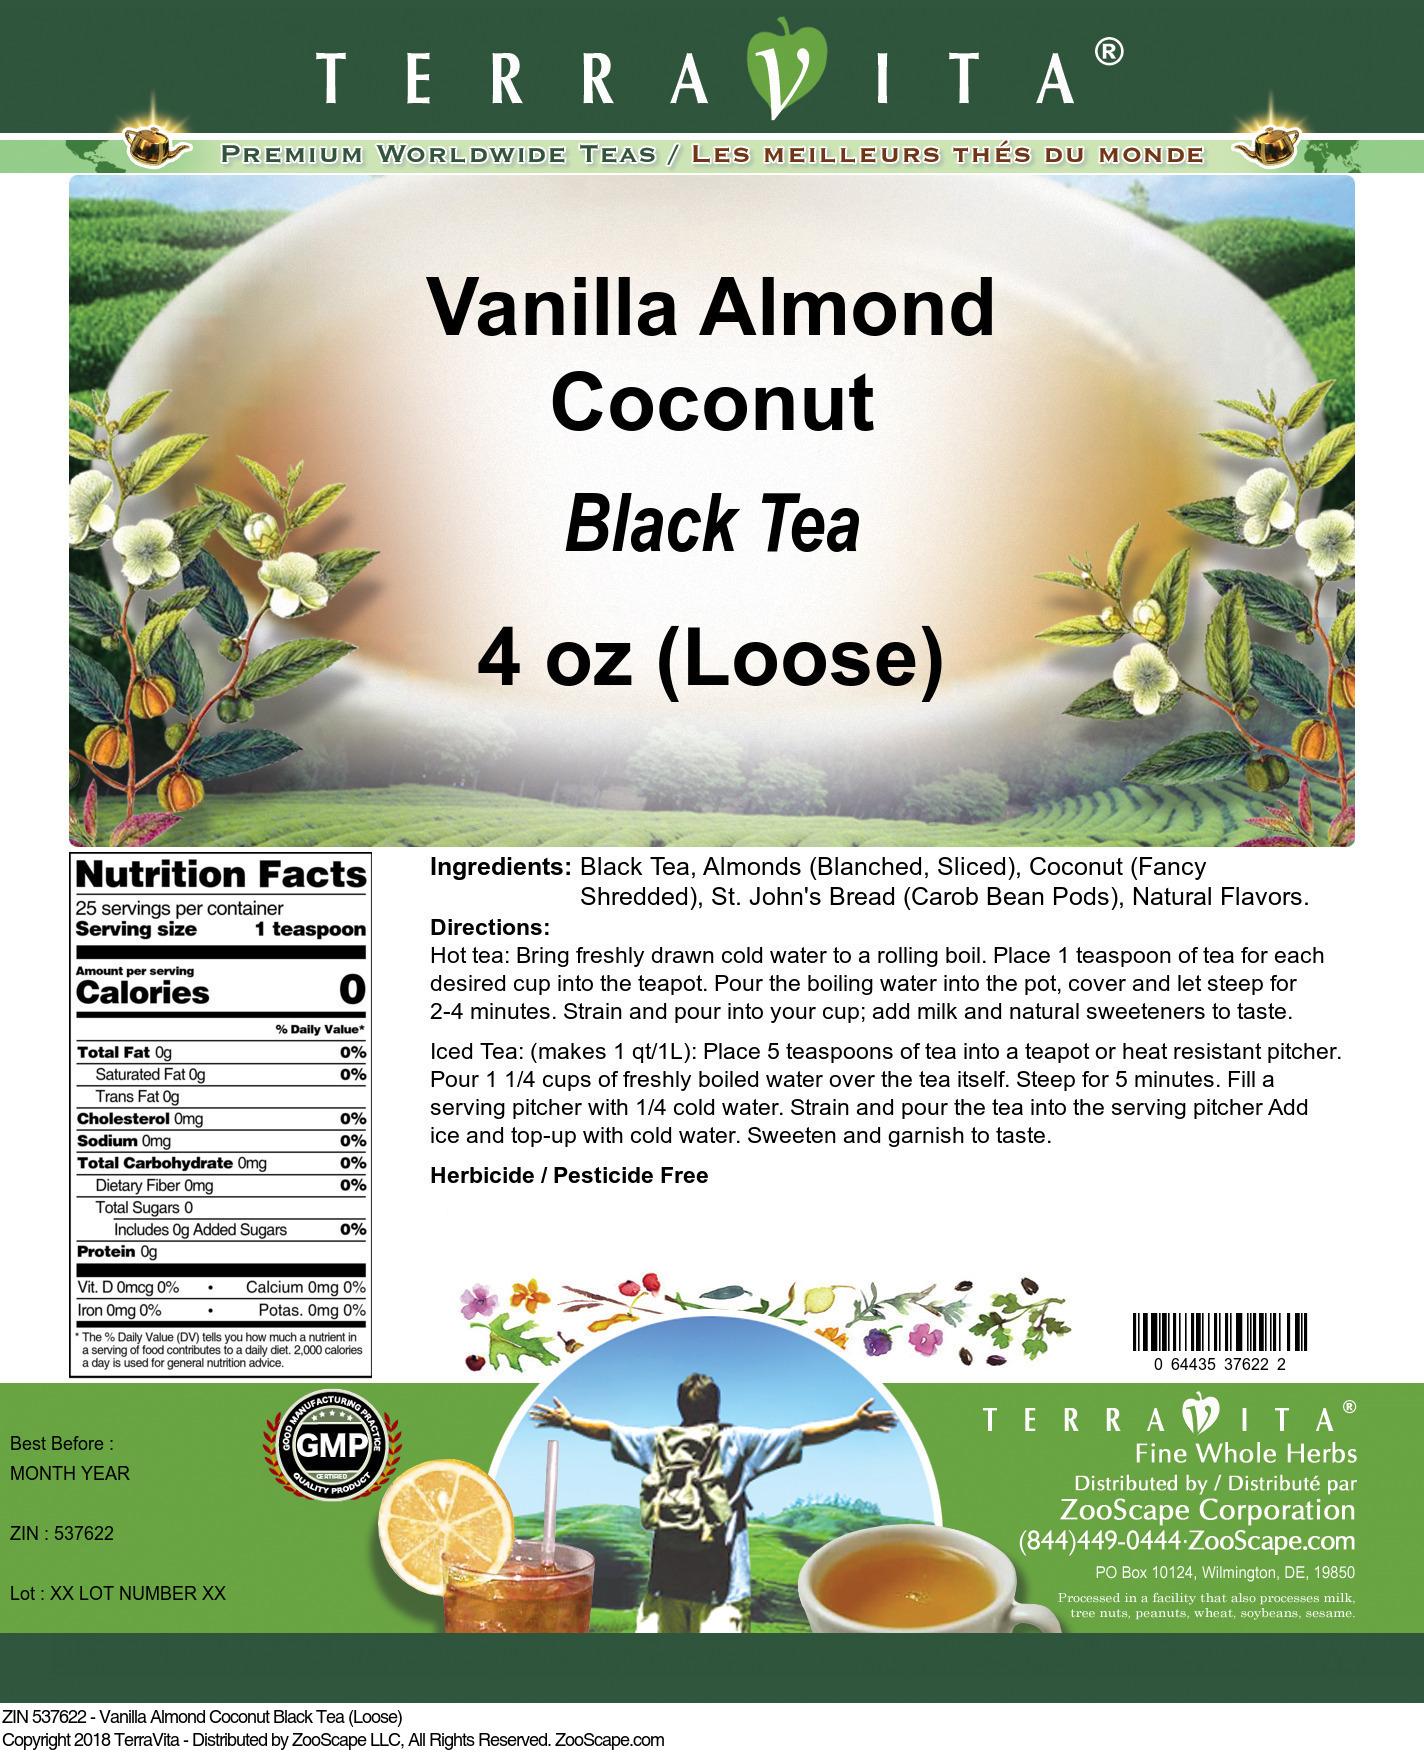 Vanilla Almond Coconut Black Tea